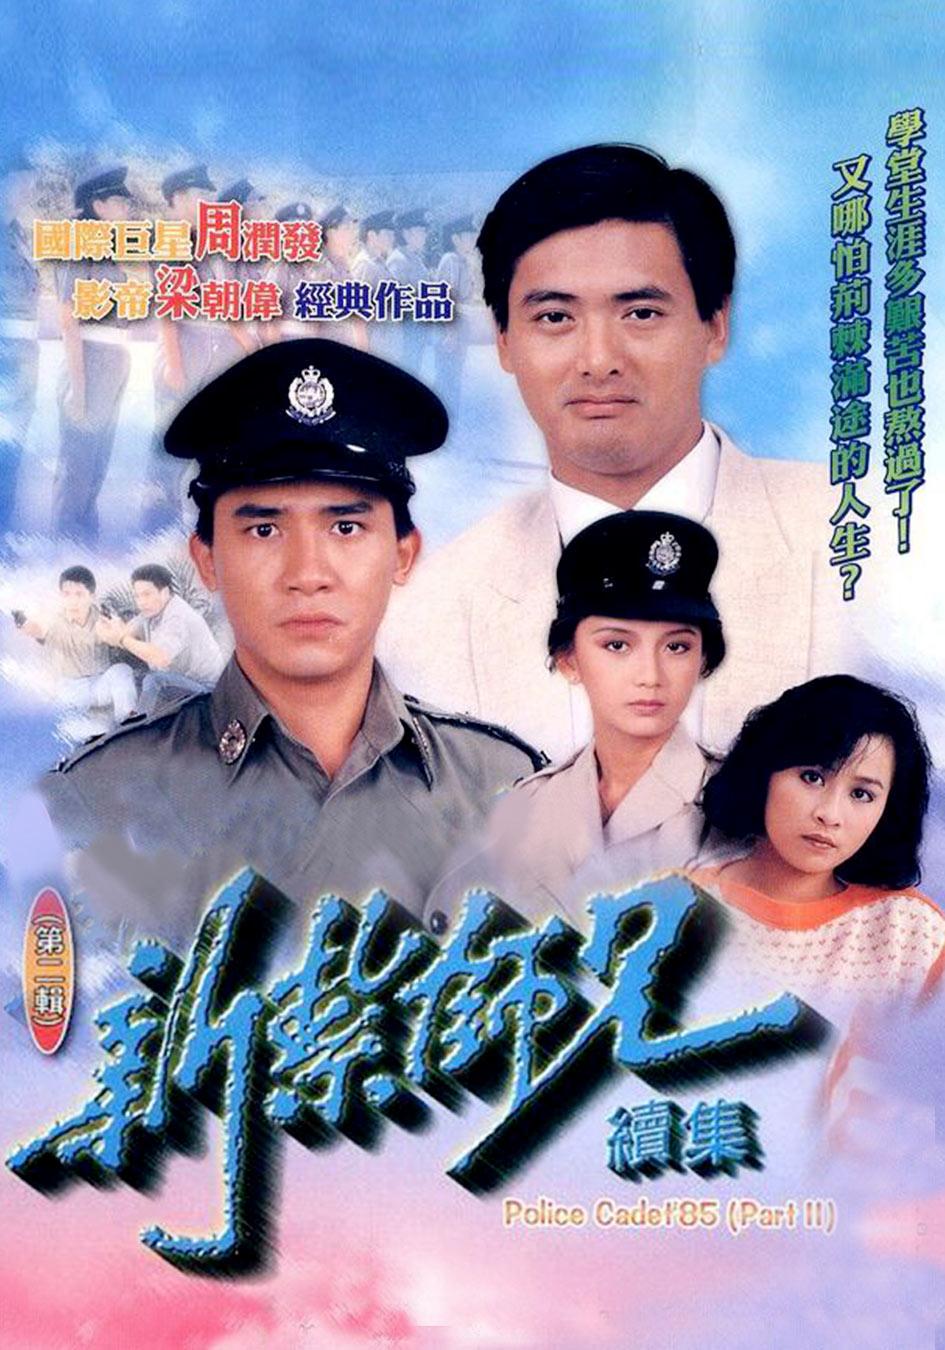 新紮師兄續集-Police Cadet '85